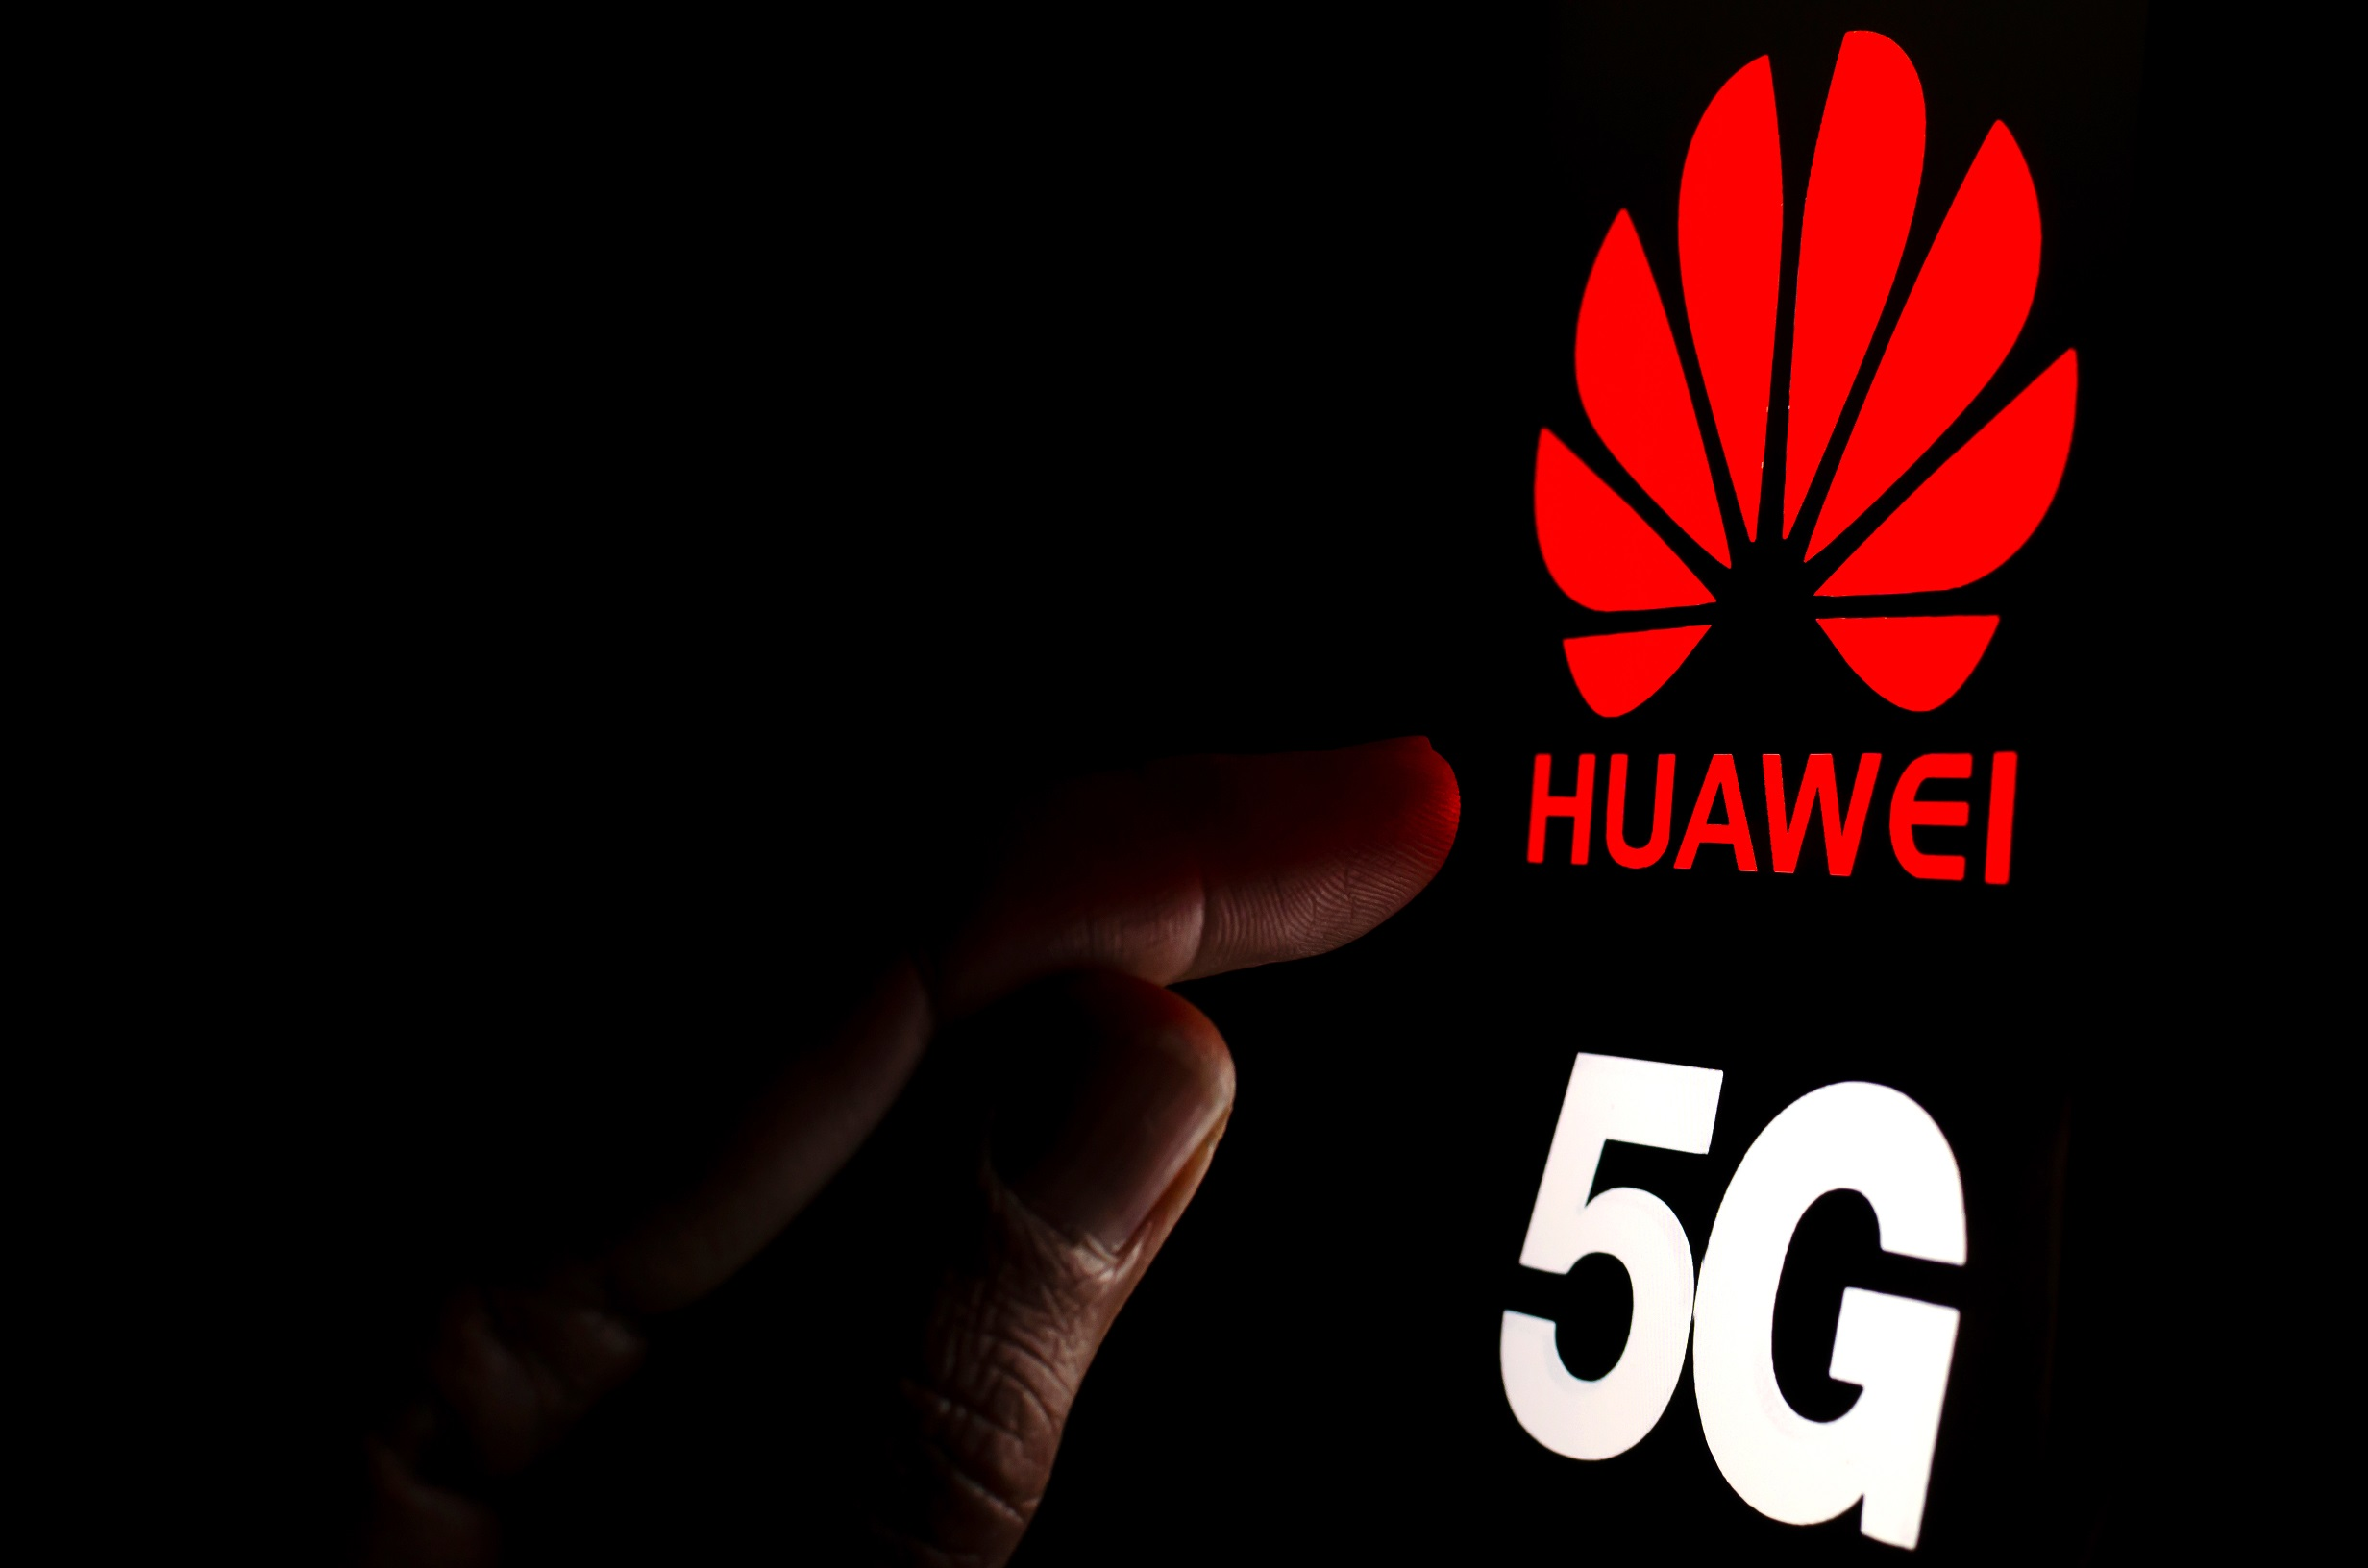 Huawei en 5G